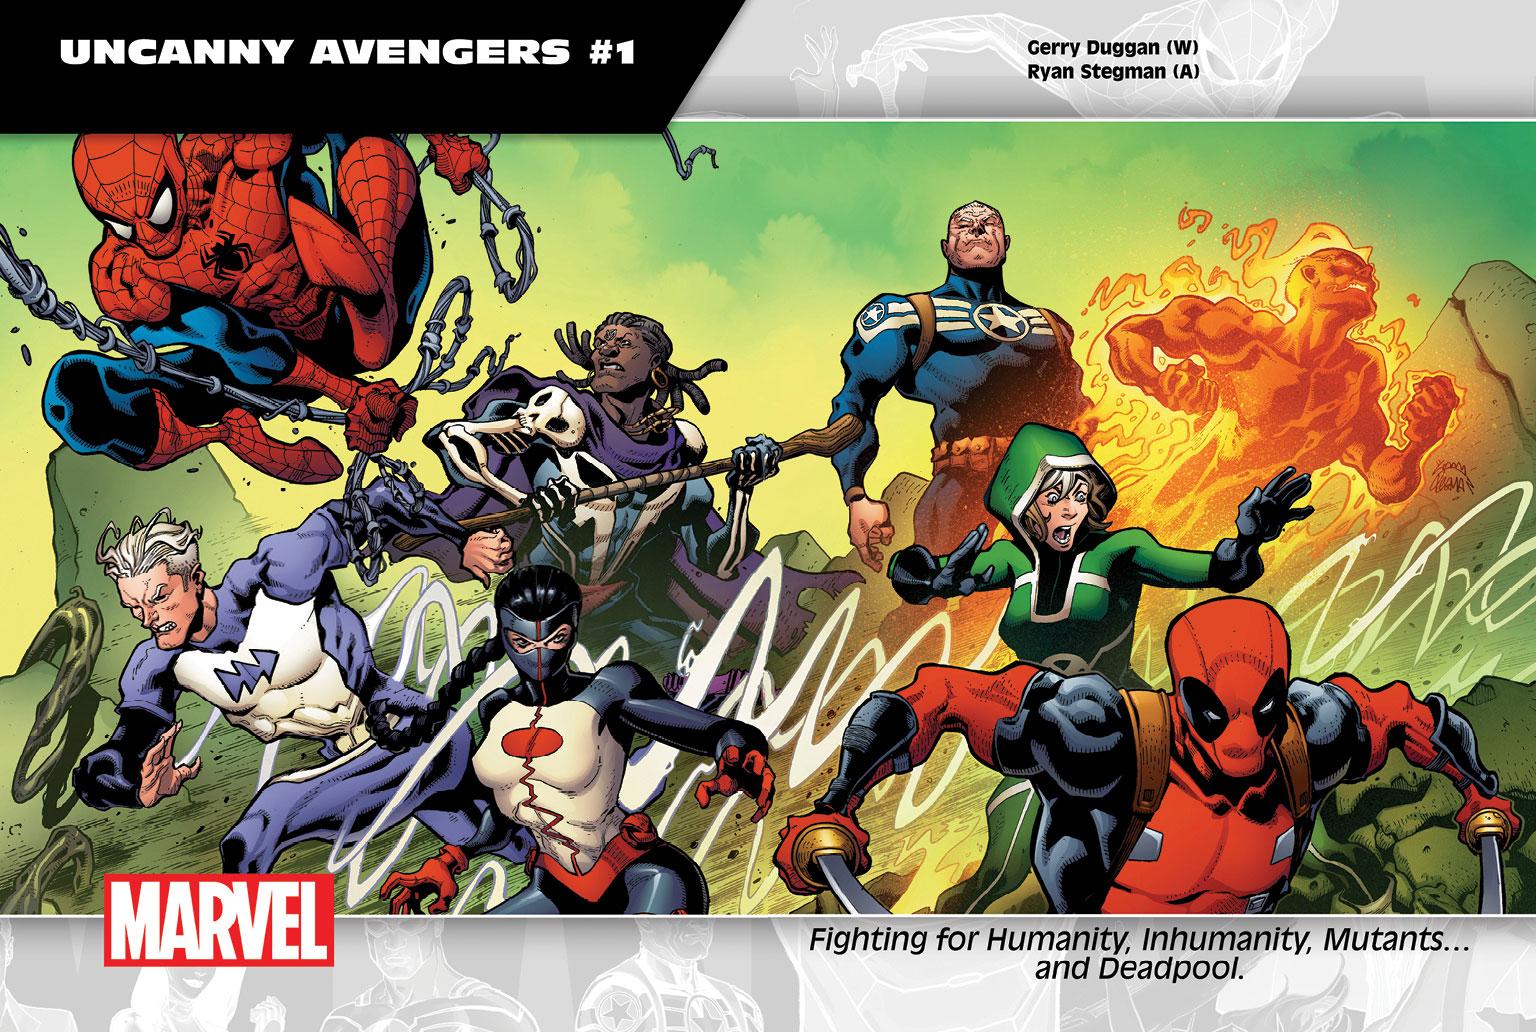 Uncanny-Avengers-1-Promo-339cd